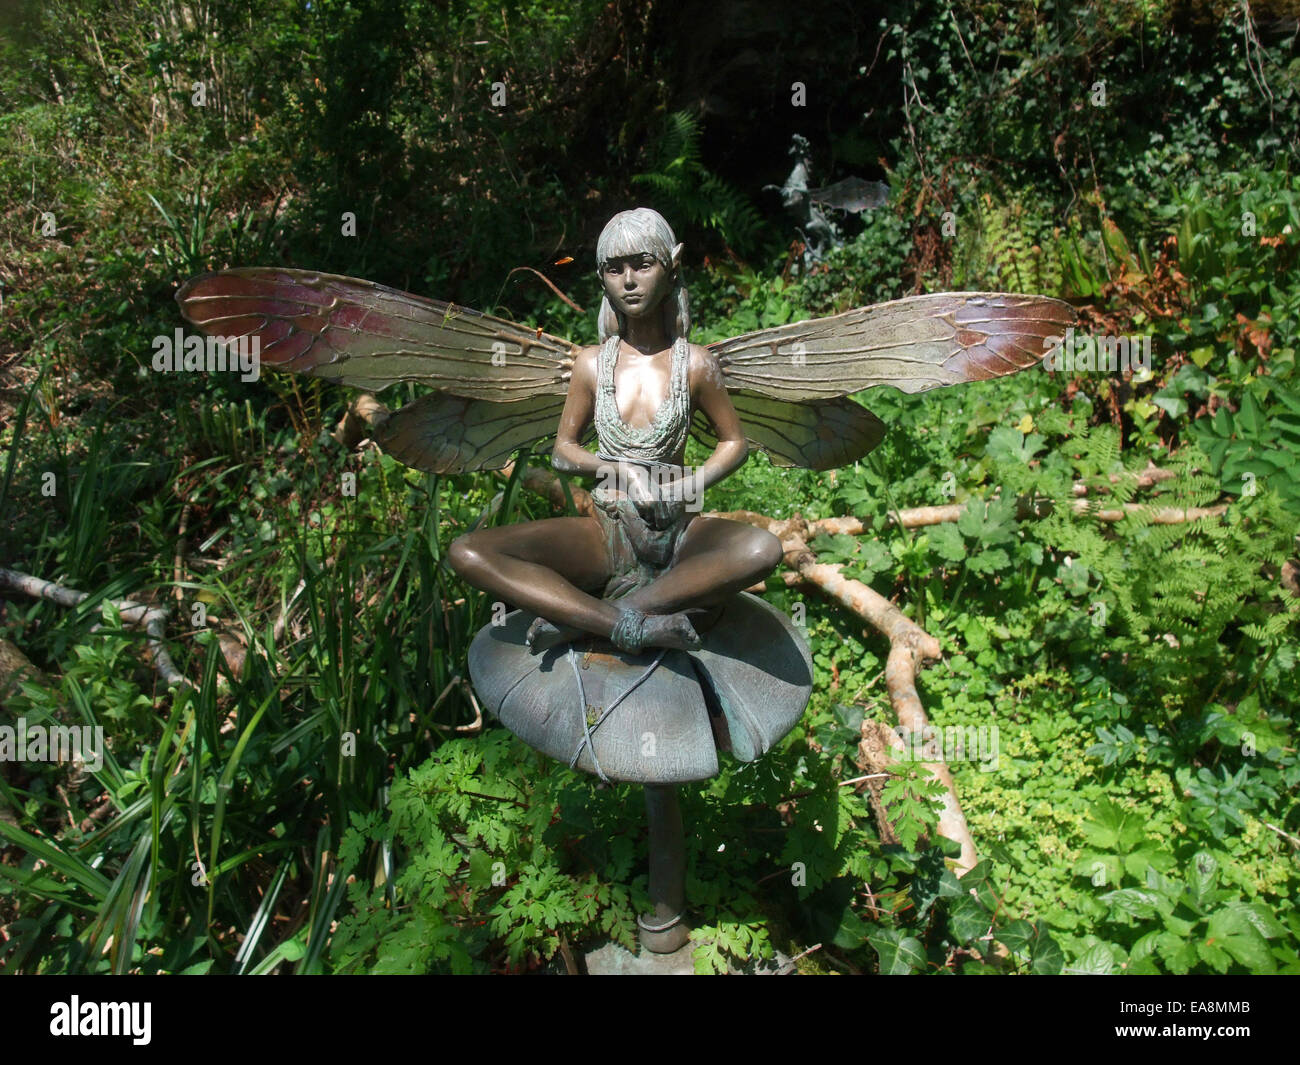 Fairy Sculpture Stock Photos Fairy Sculpture Stock Images